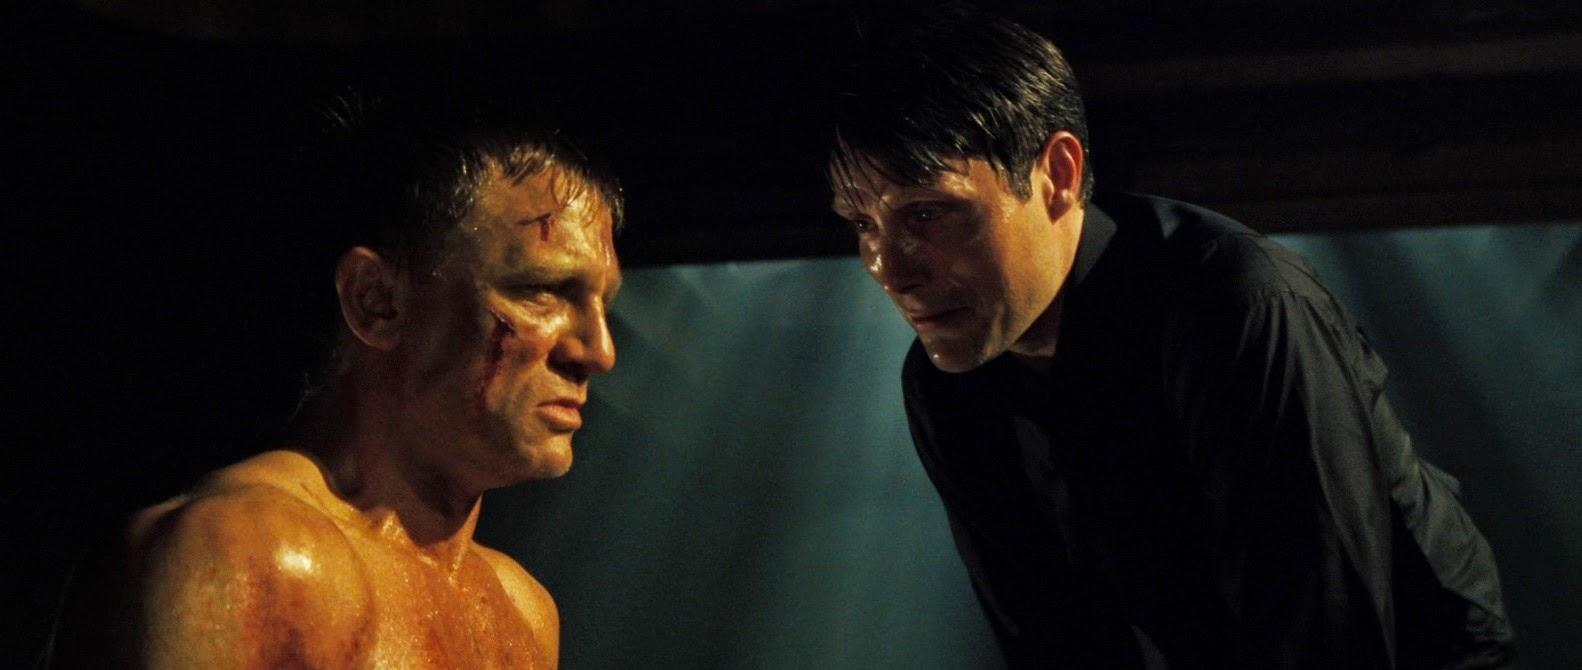 Svettigt möte mellan James Bond och Le Chiffre. Foto: United International Pictures.